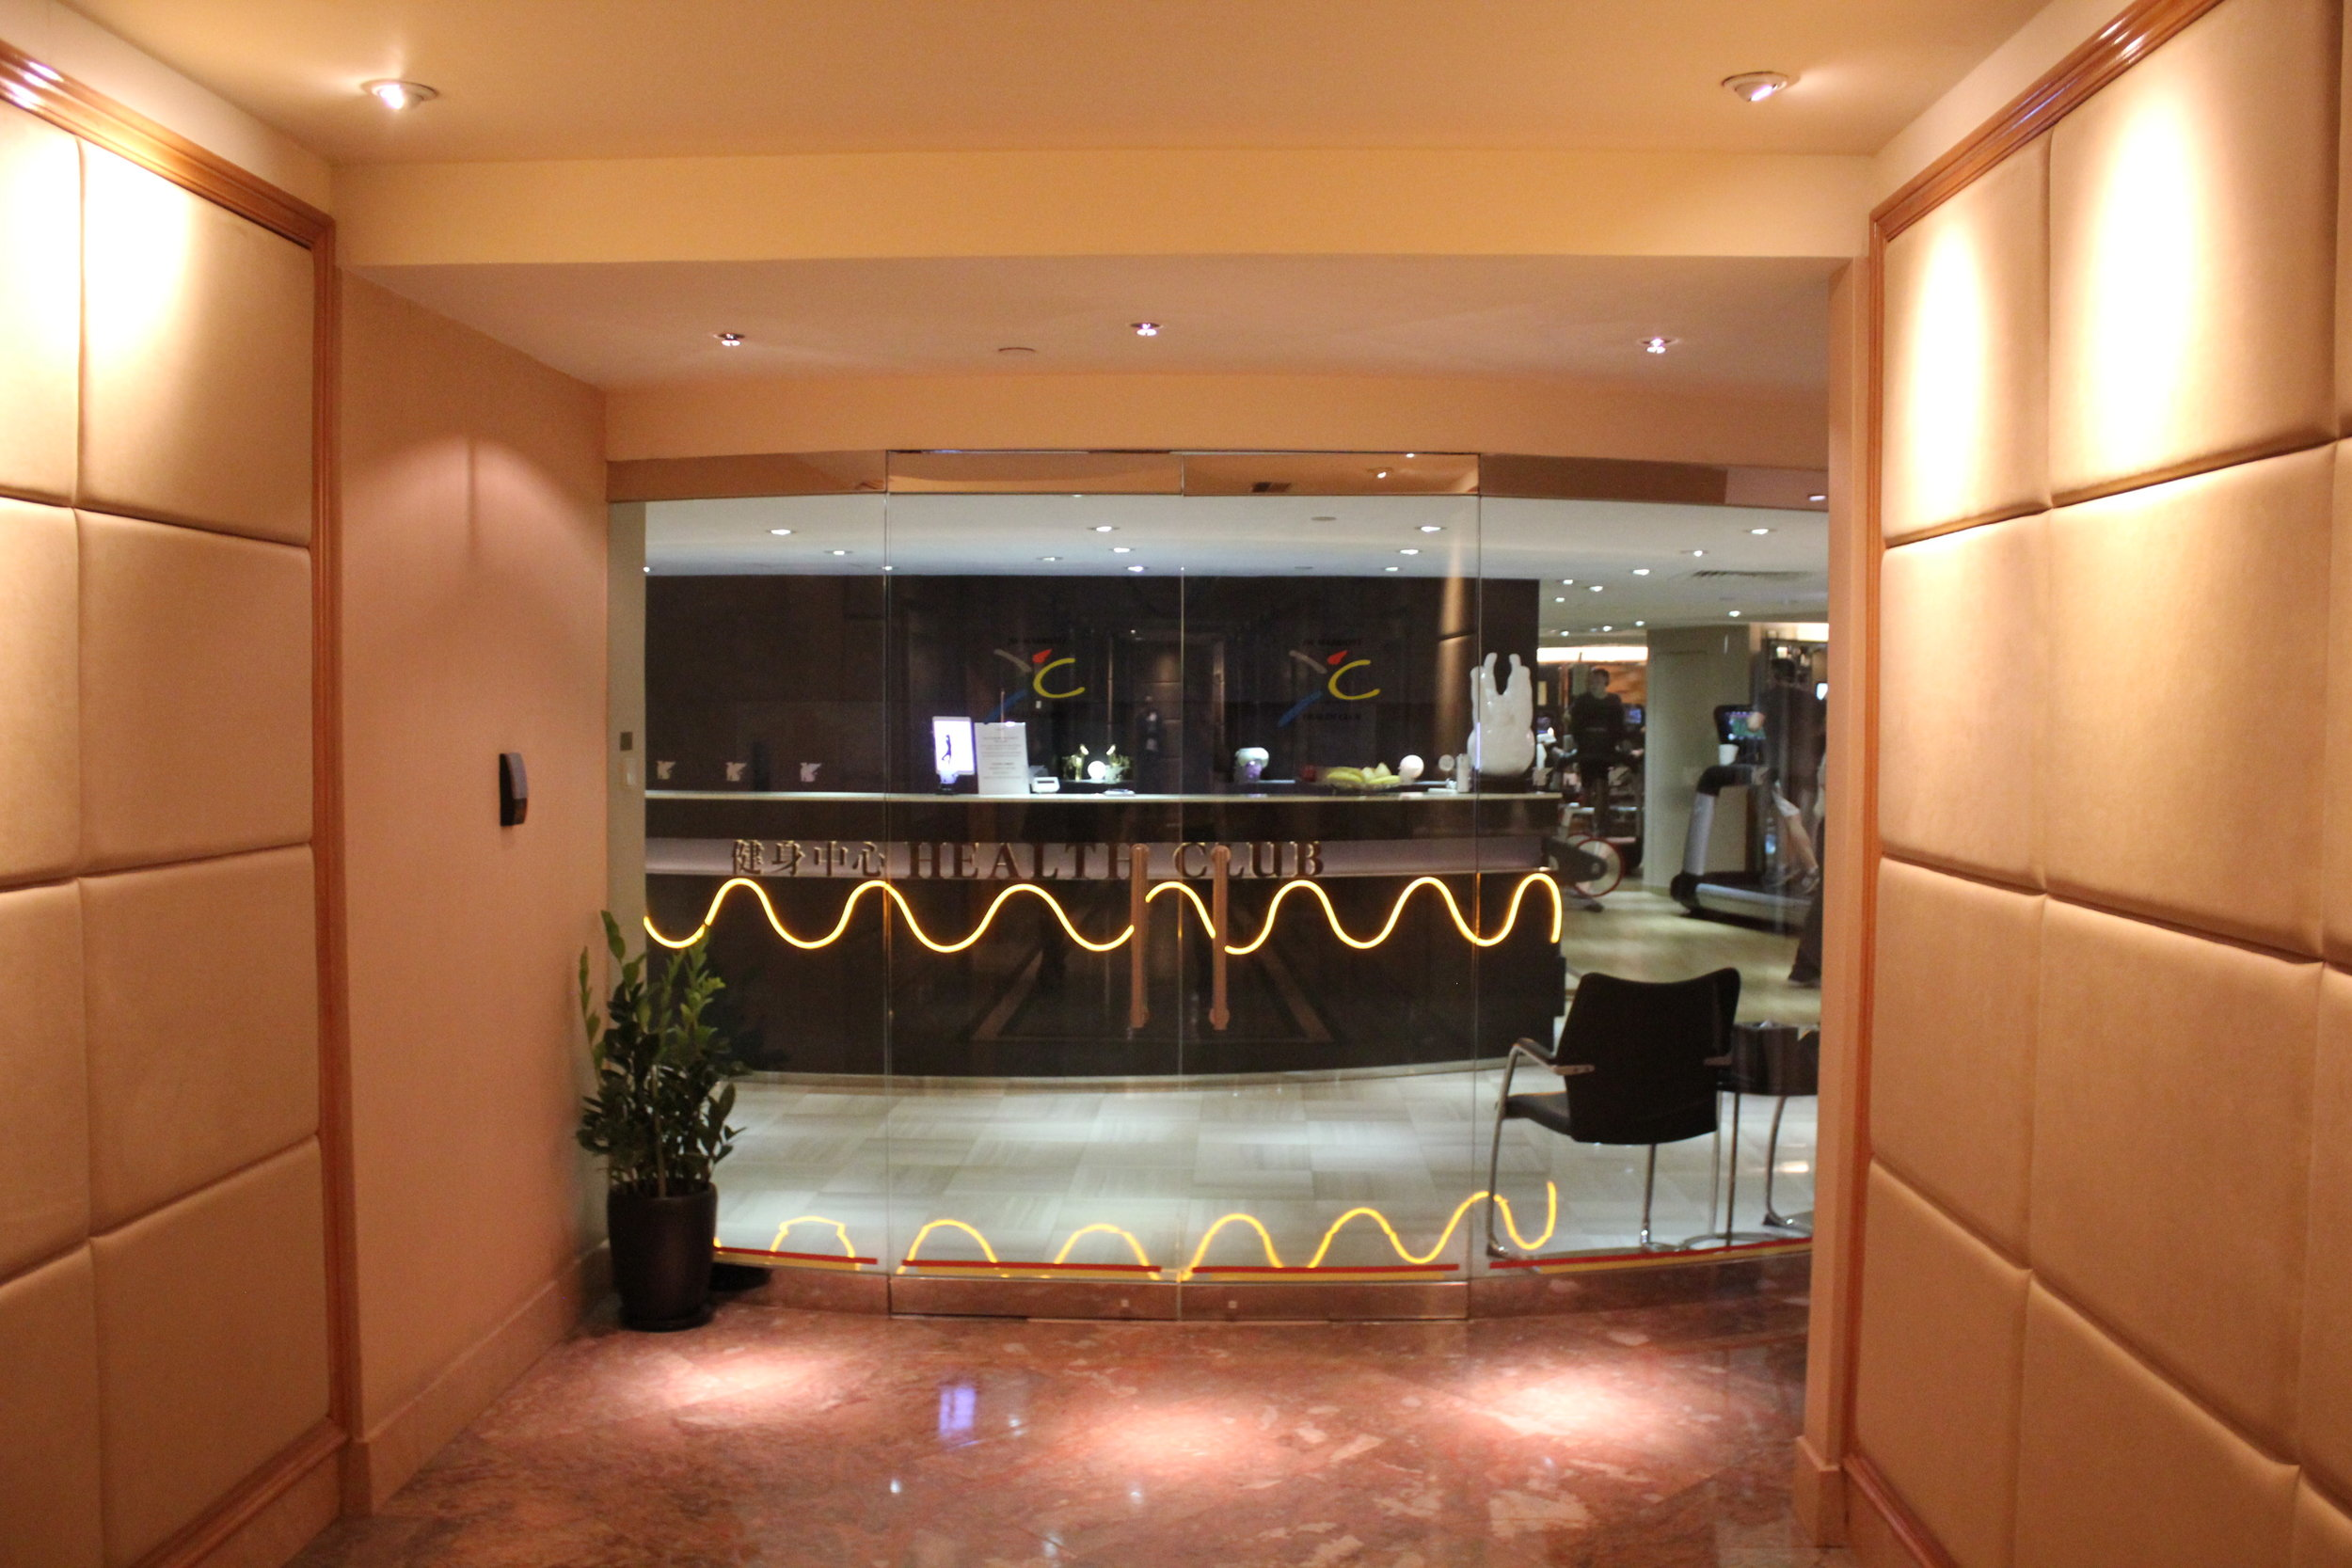 JW Marriott Hong Kong – Health Club